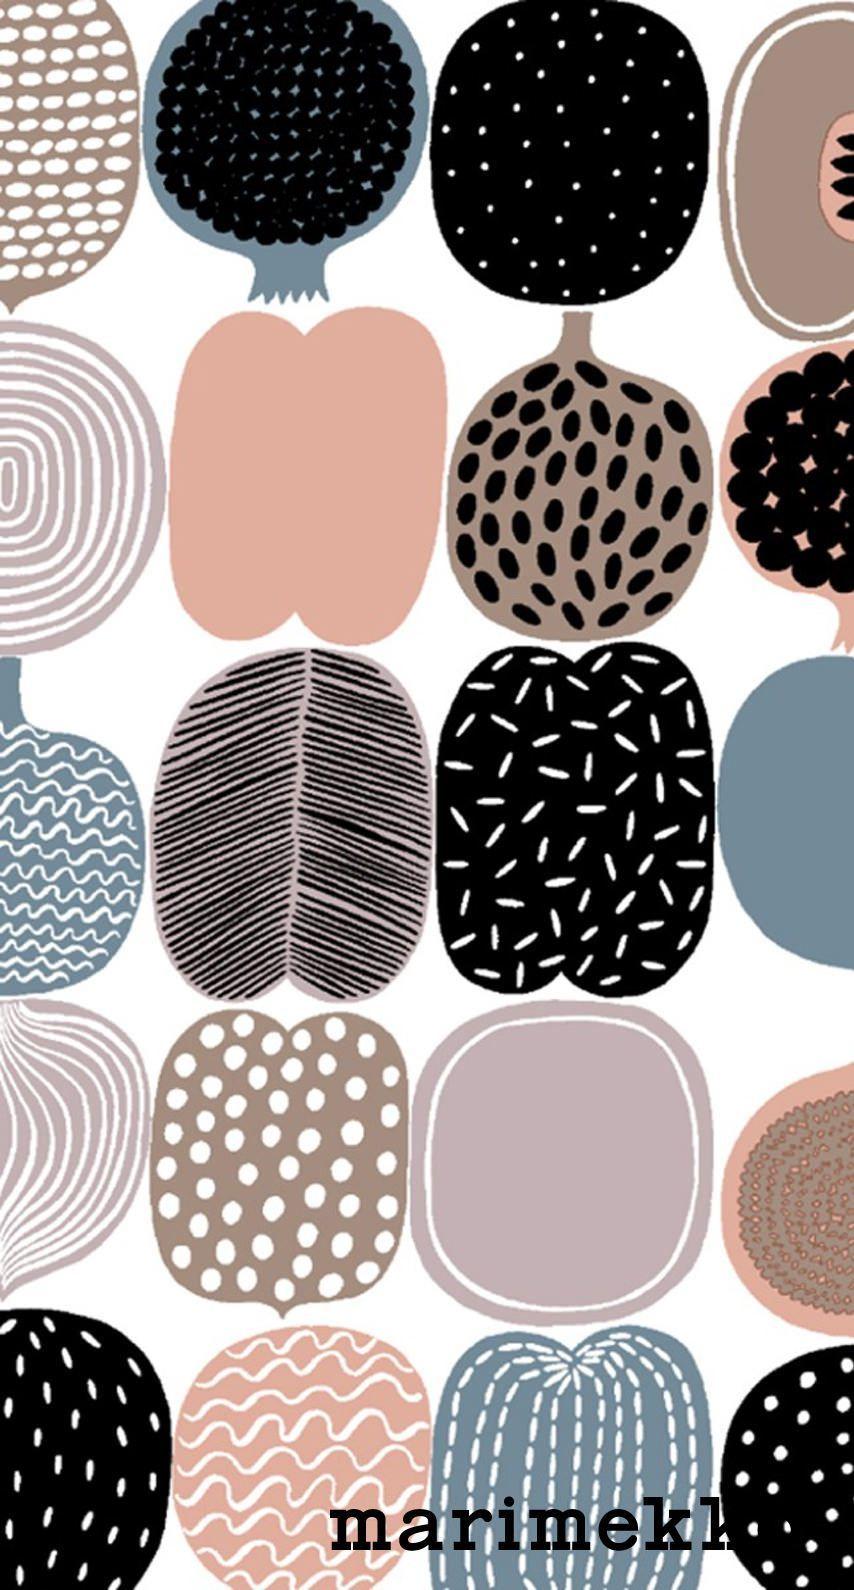 Marimekko Iphone Wallpaper Marimekko Pattern Marimekko Wallpaper Marimekko